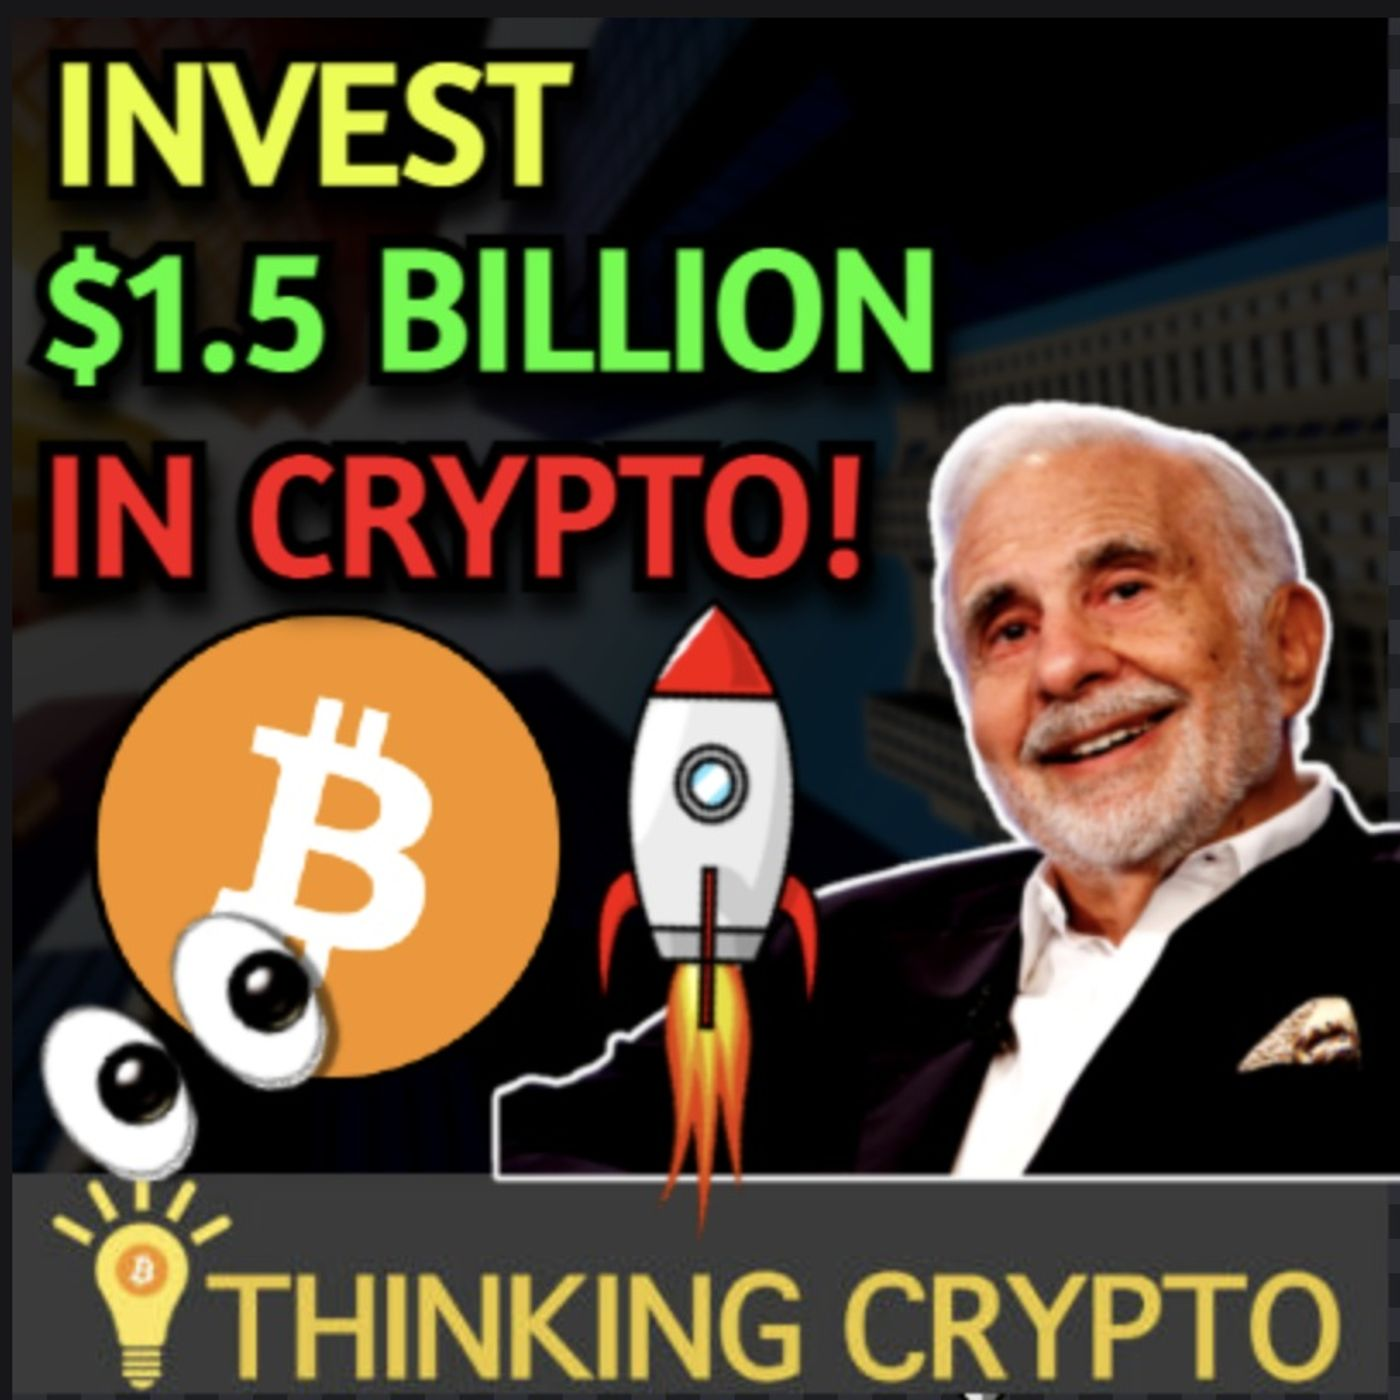 Billionaire Carl Icahn Wants To Invest $1.5 Billion in Crypto & Fidelity $102 Million Bitcoin Fund